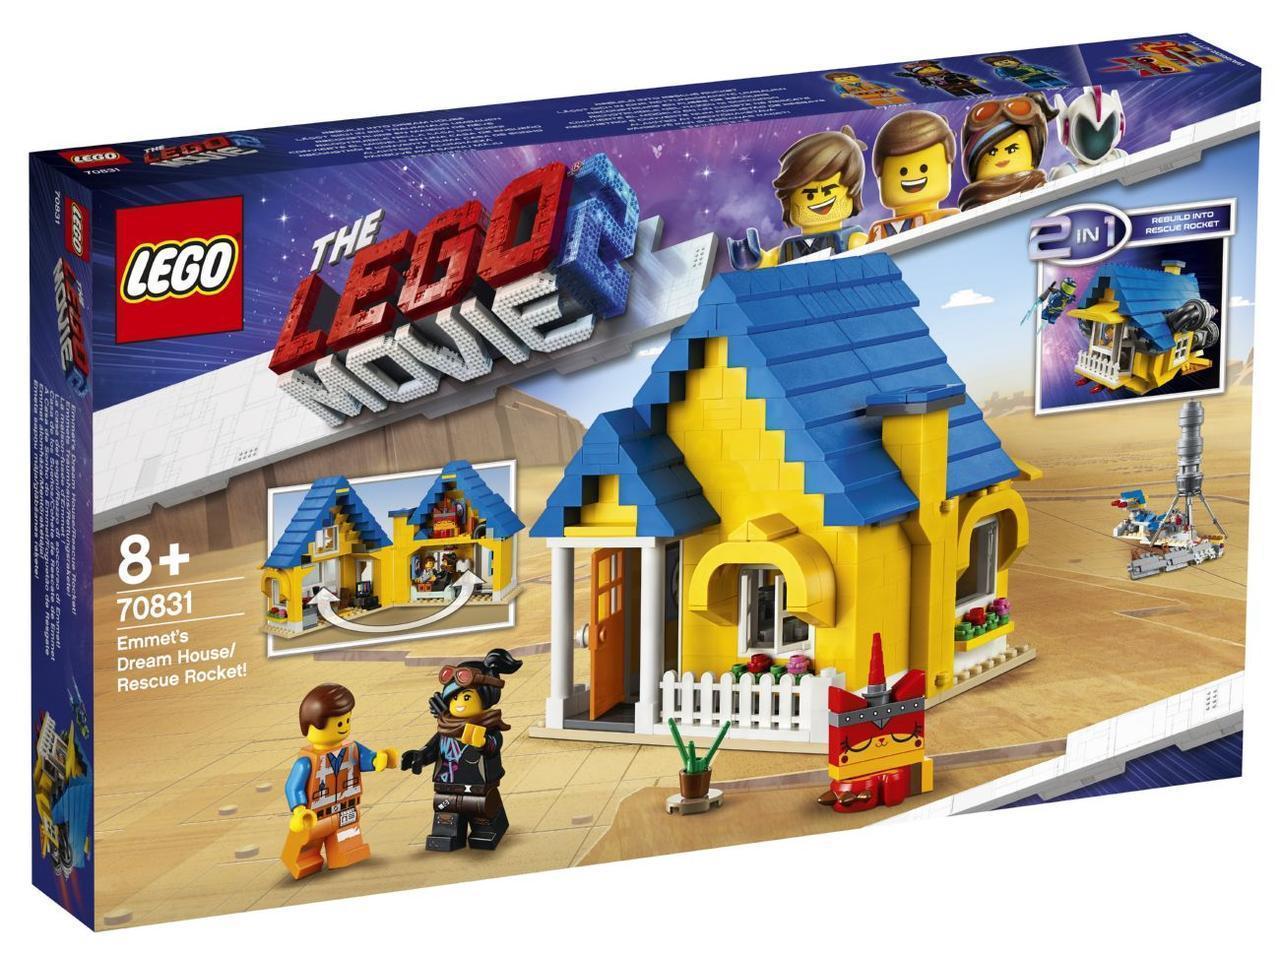 Lego Movie 2 Дом мечты / Спасательная ракета Эммета! 70831